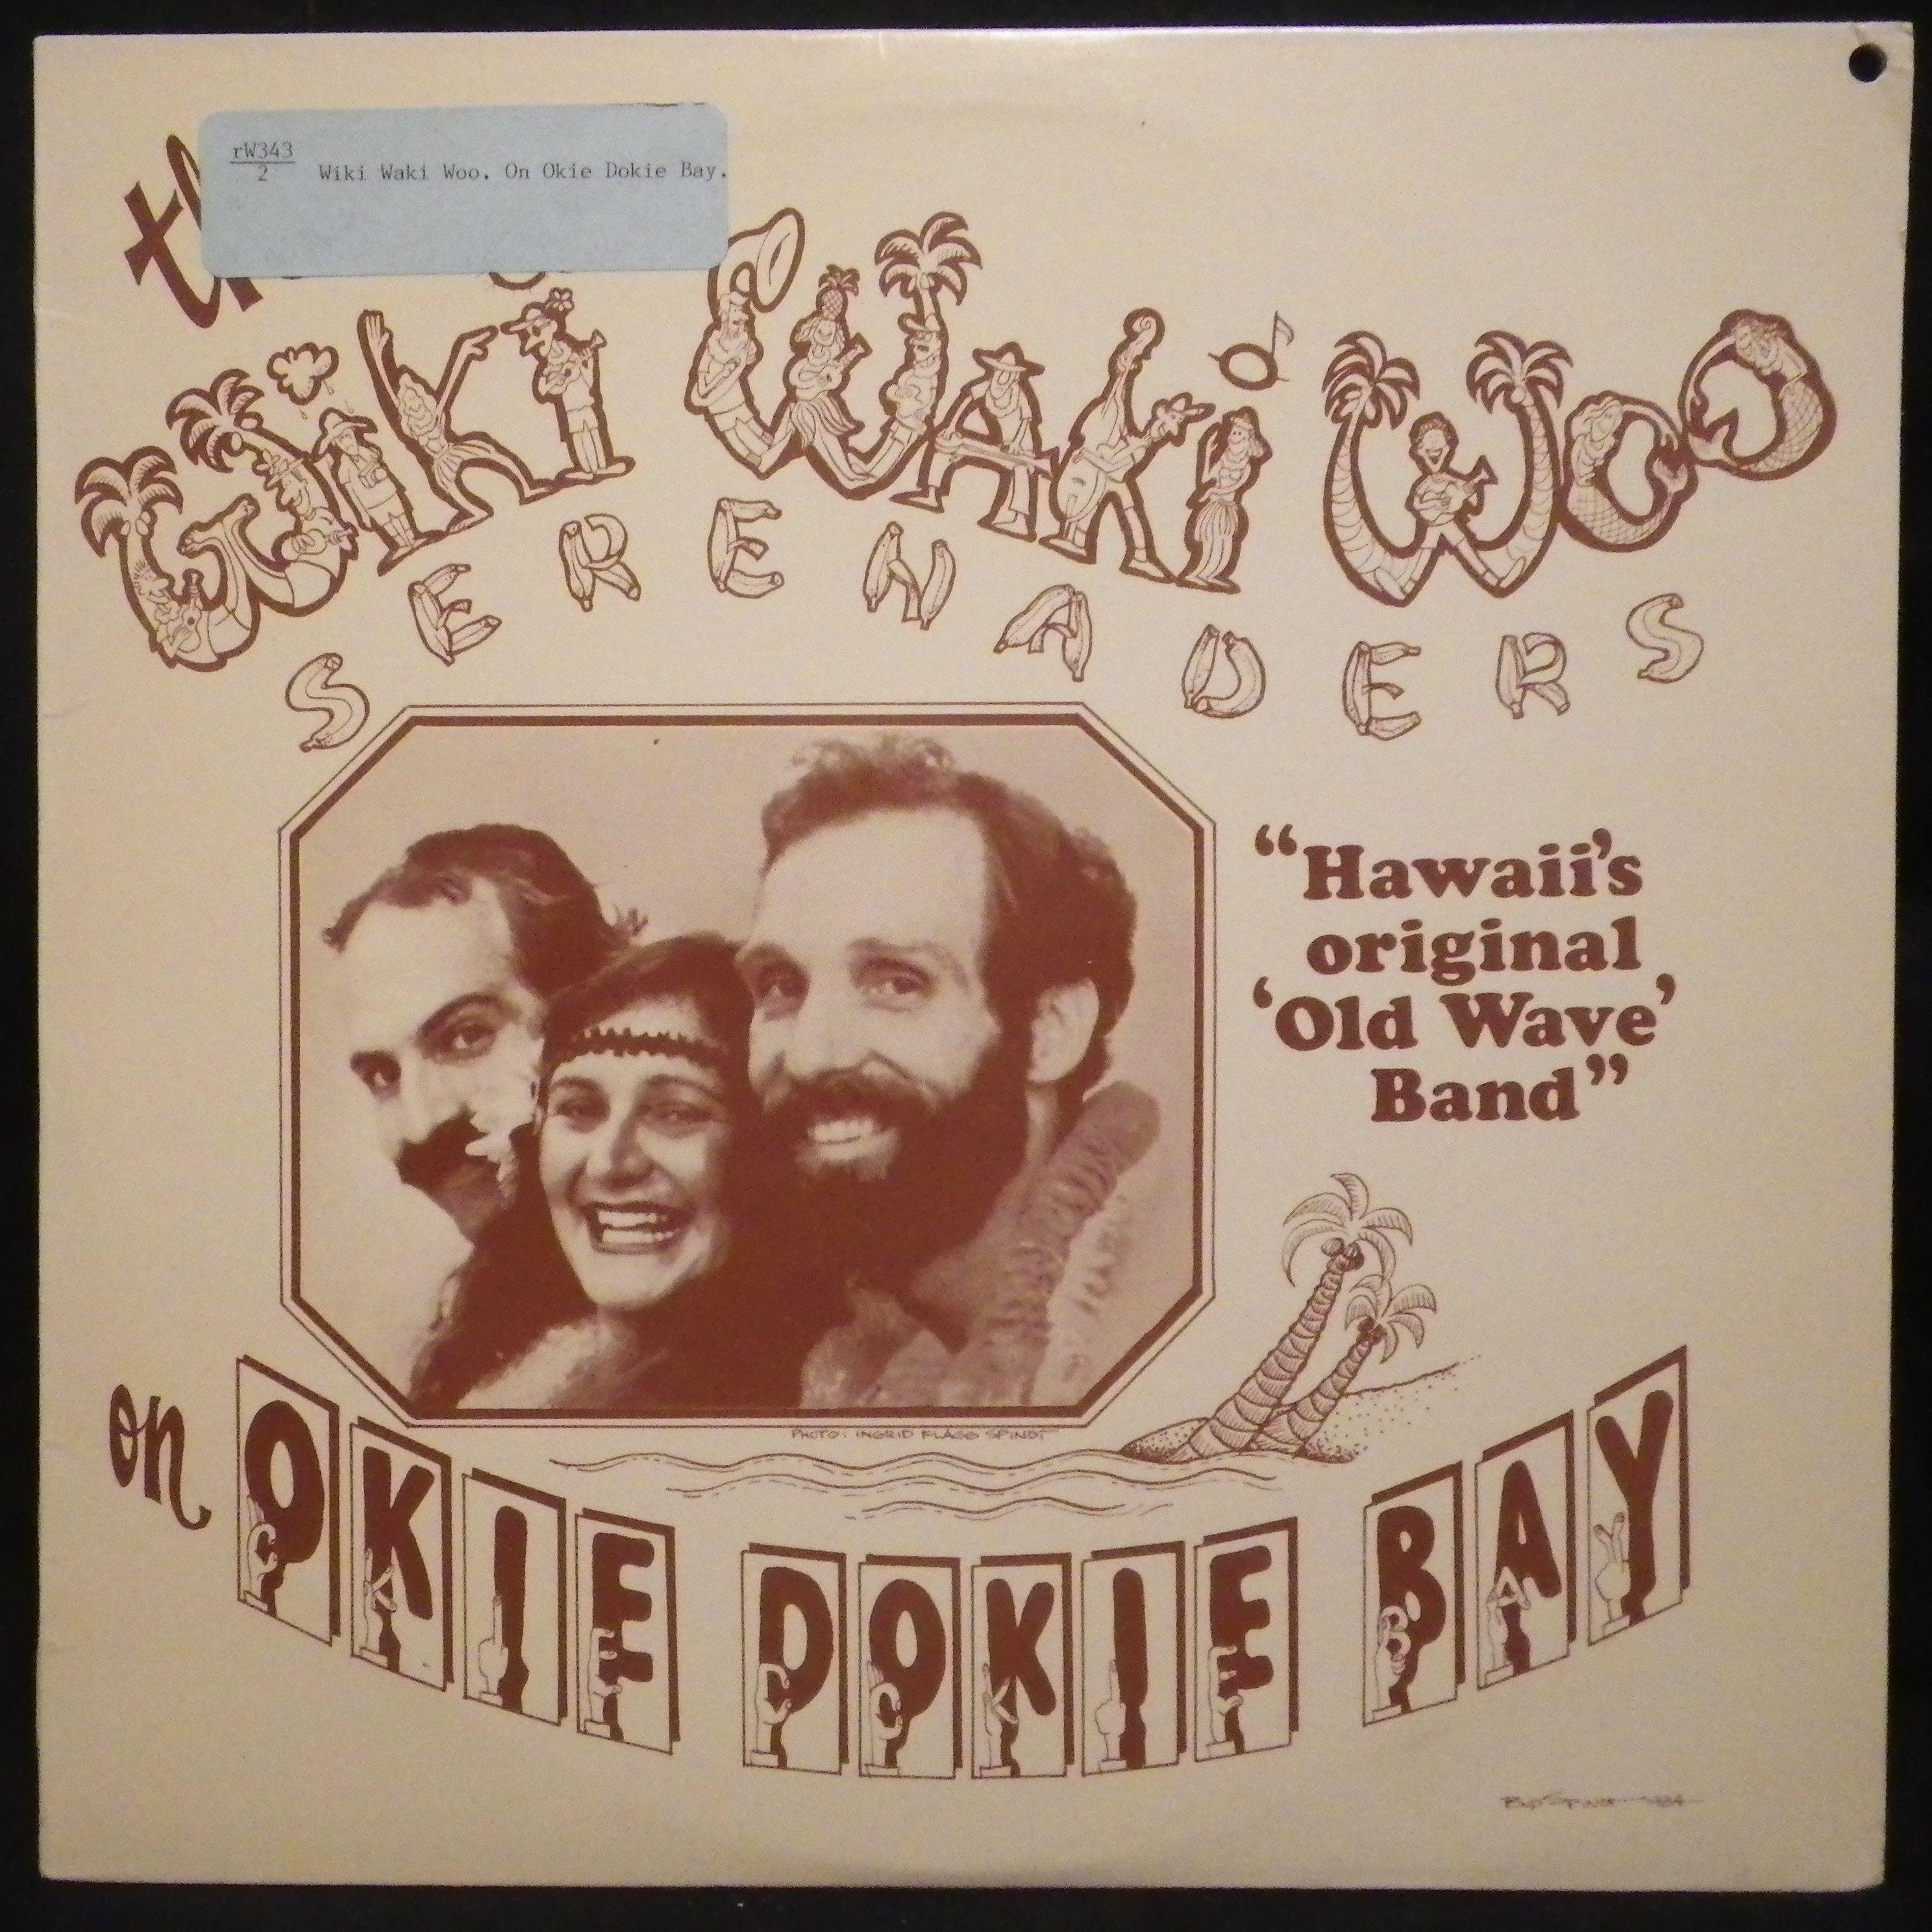 On Okie Dokie Bay [by] The Wiki Waki Woo Serenaders